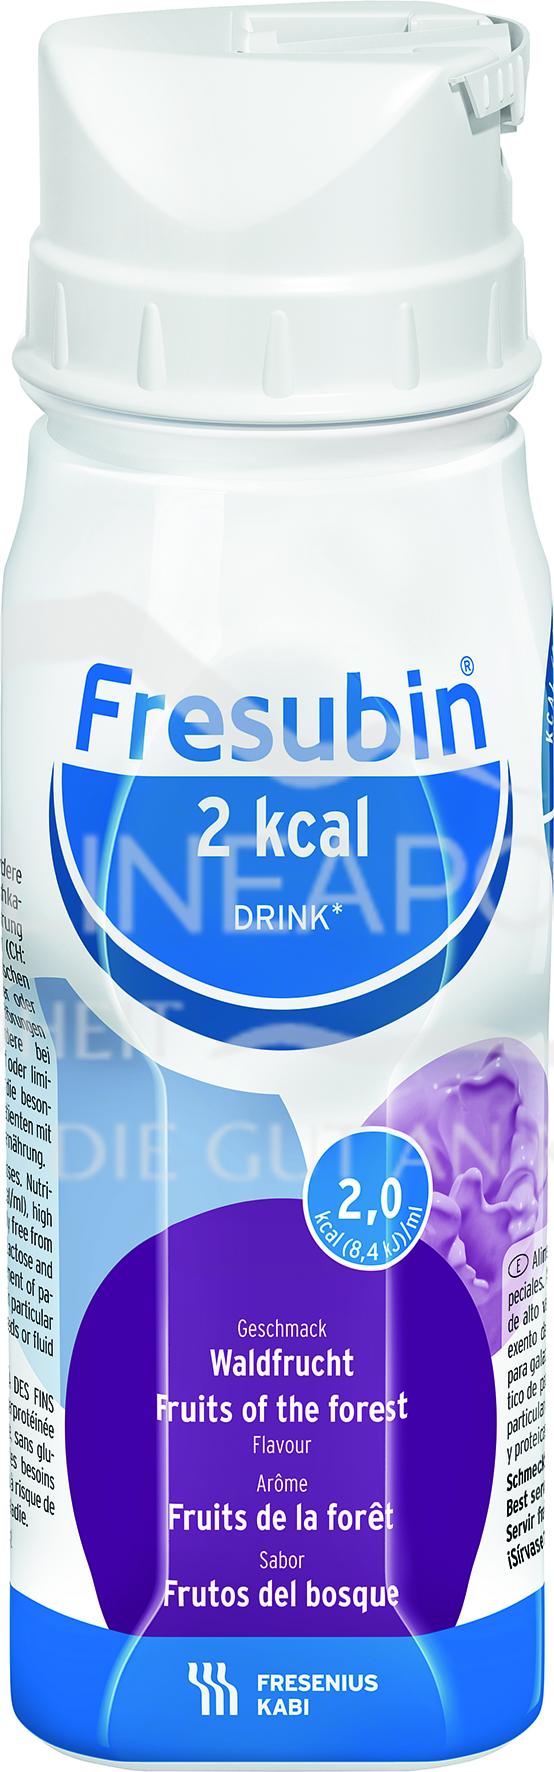 Fresubin® 2kcal Drink Waldfrucht